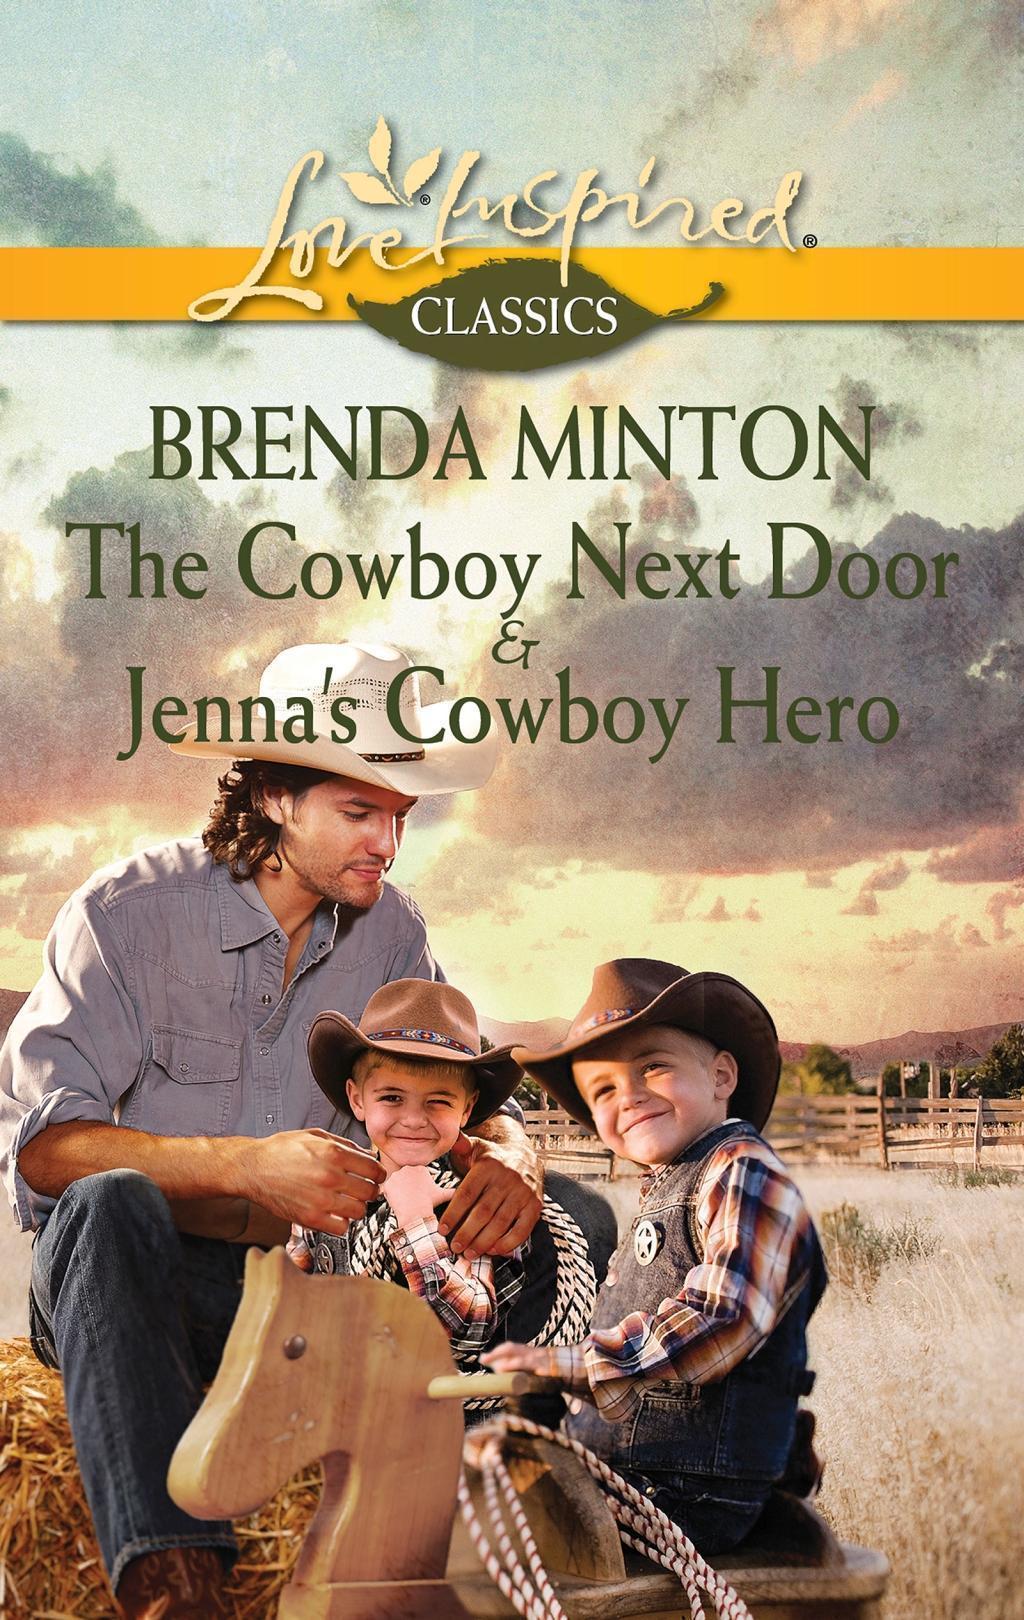 The Cowboy Next Door & Jenna's Cowboy Hero: The Cowboy Next Door / Jenna's Cowboy Hero (Mills & Boon M&B)